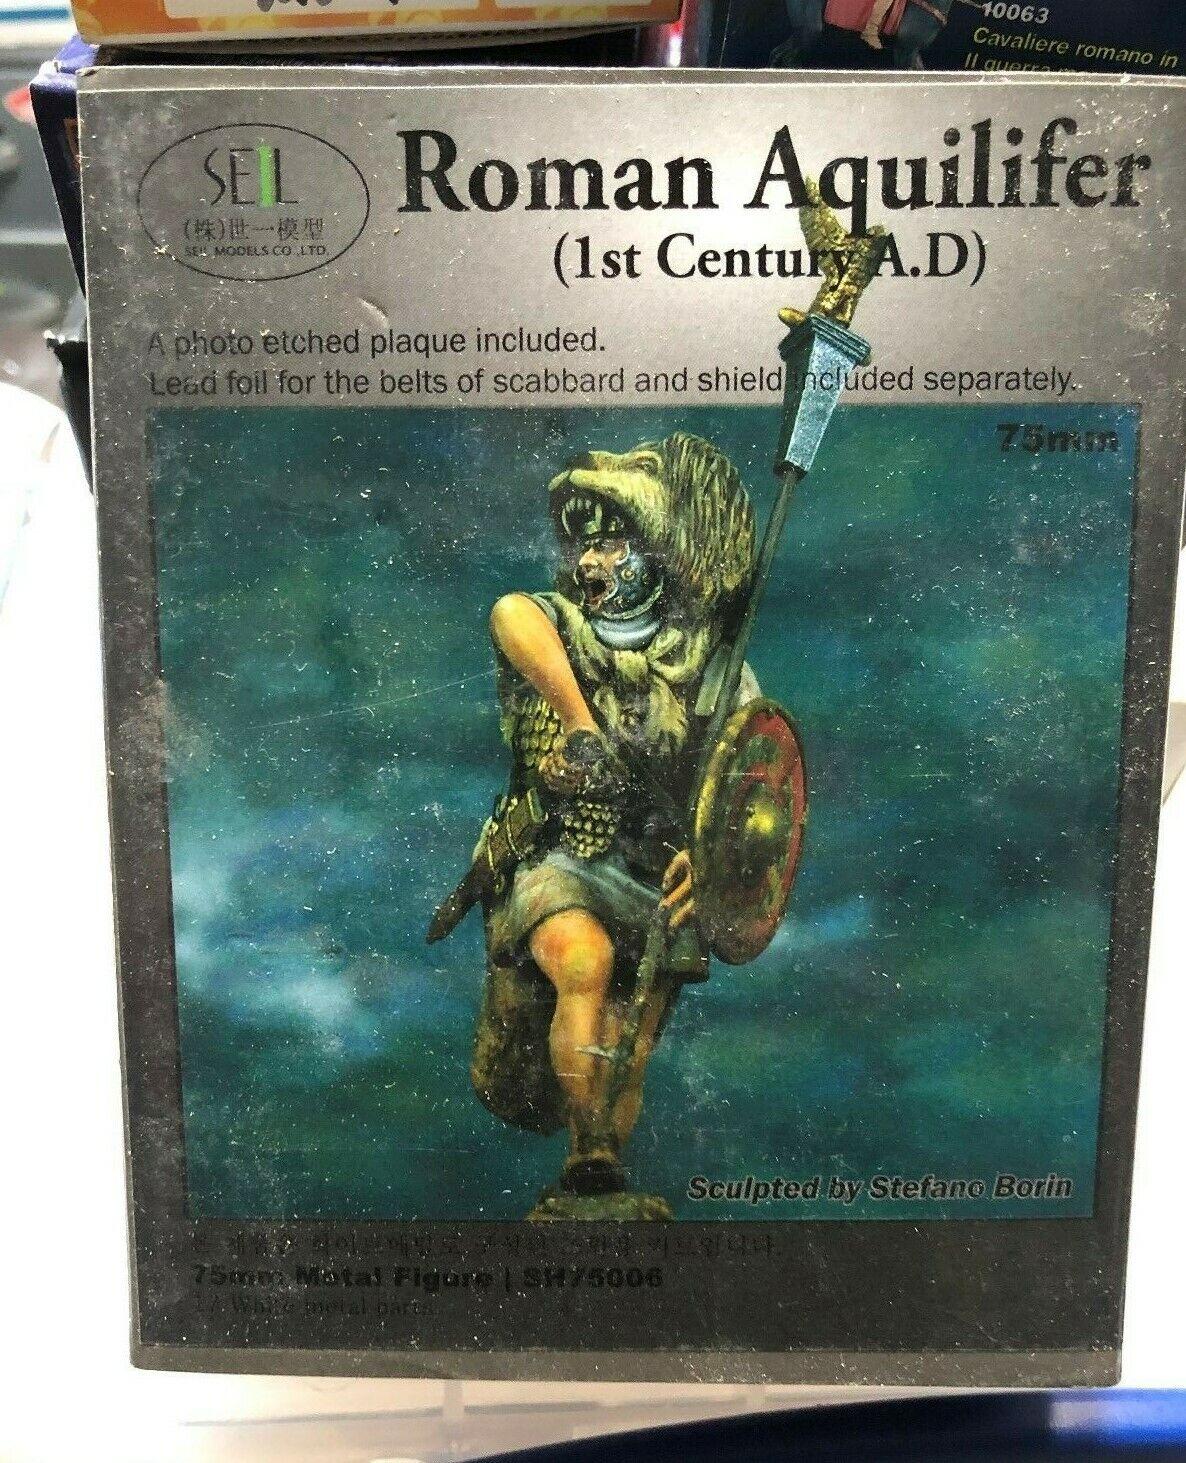 75MM ROMAN AQUILIFER SEIL MODELS  SUPER WHITE METAL KIT